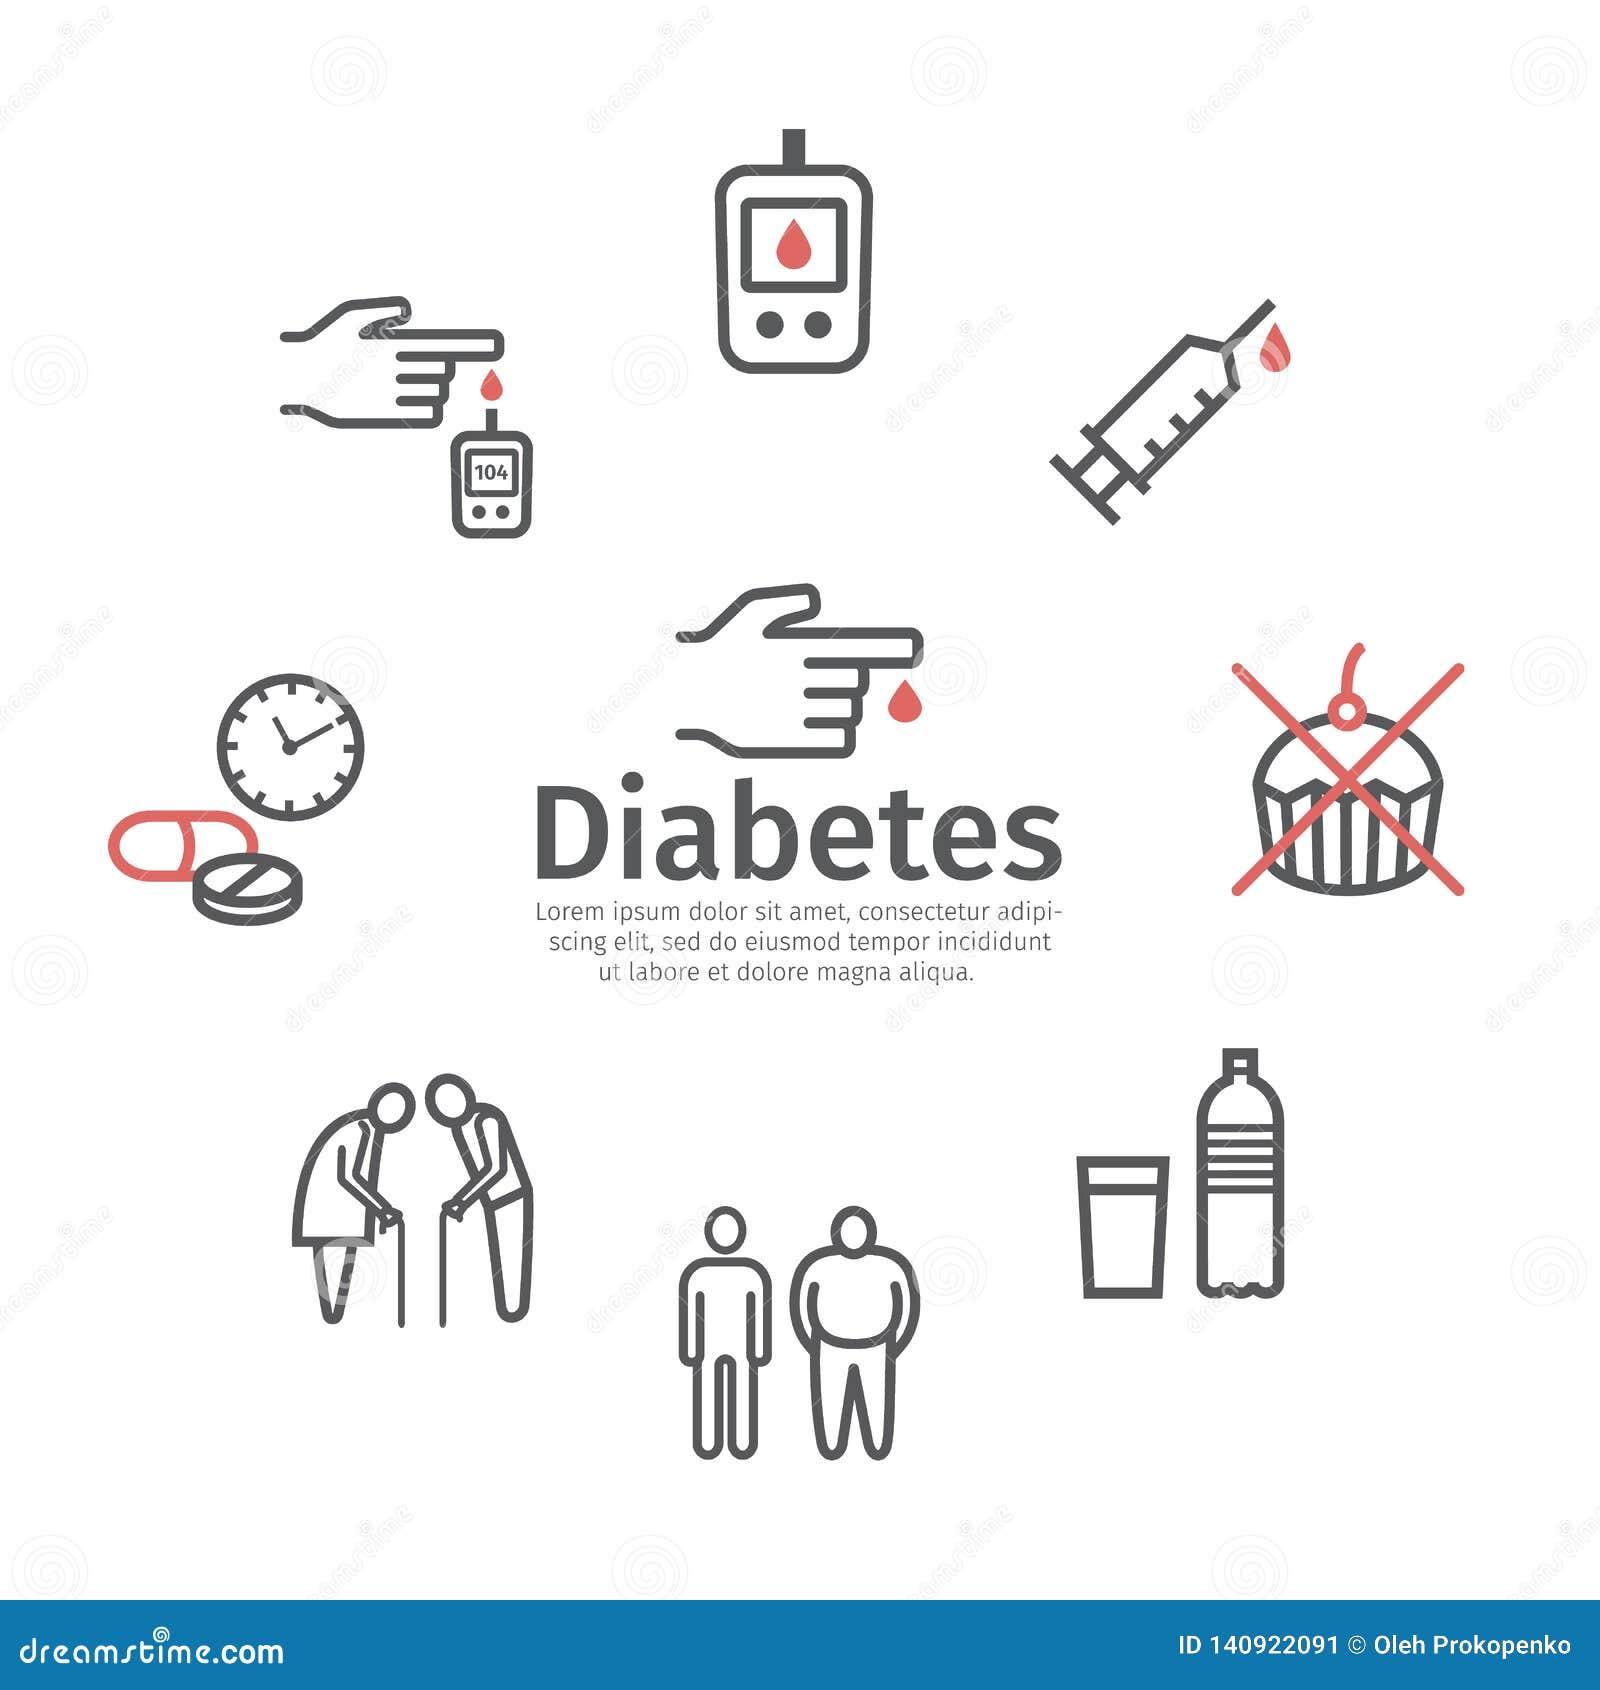 síntomas de diabetes en línea